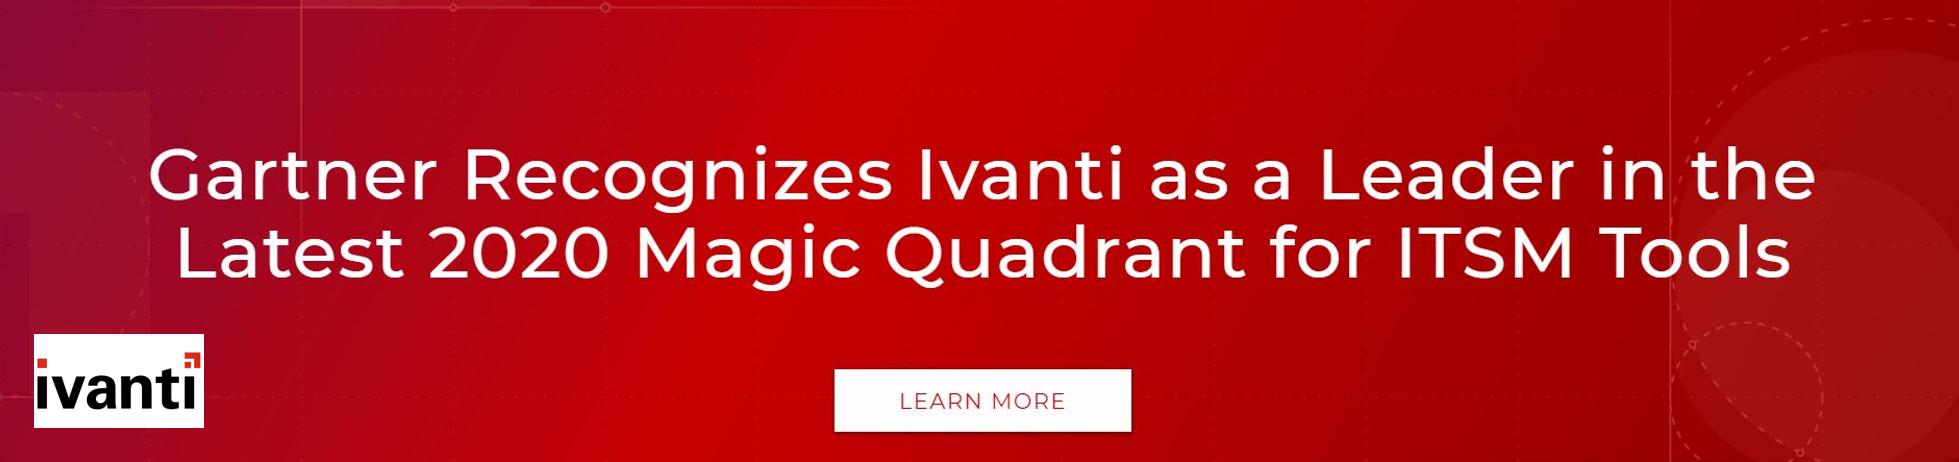 ivanti banner